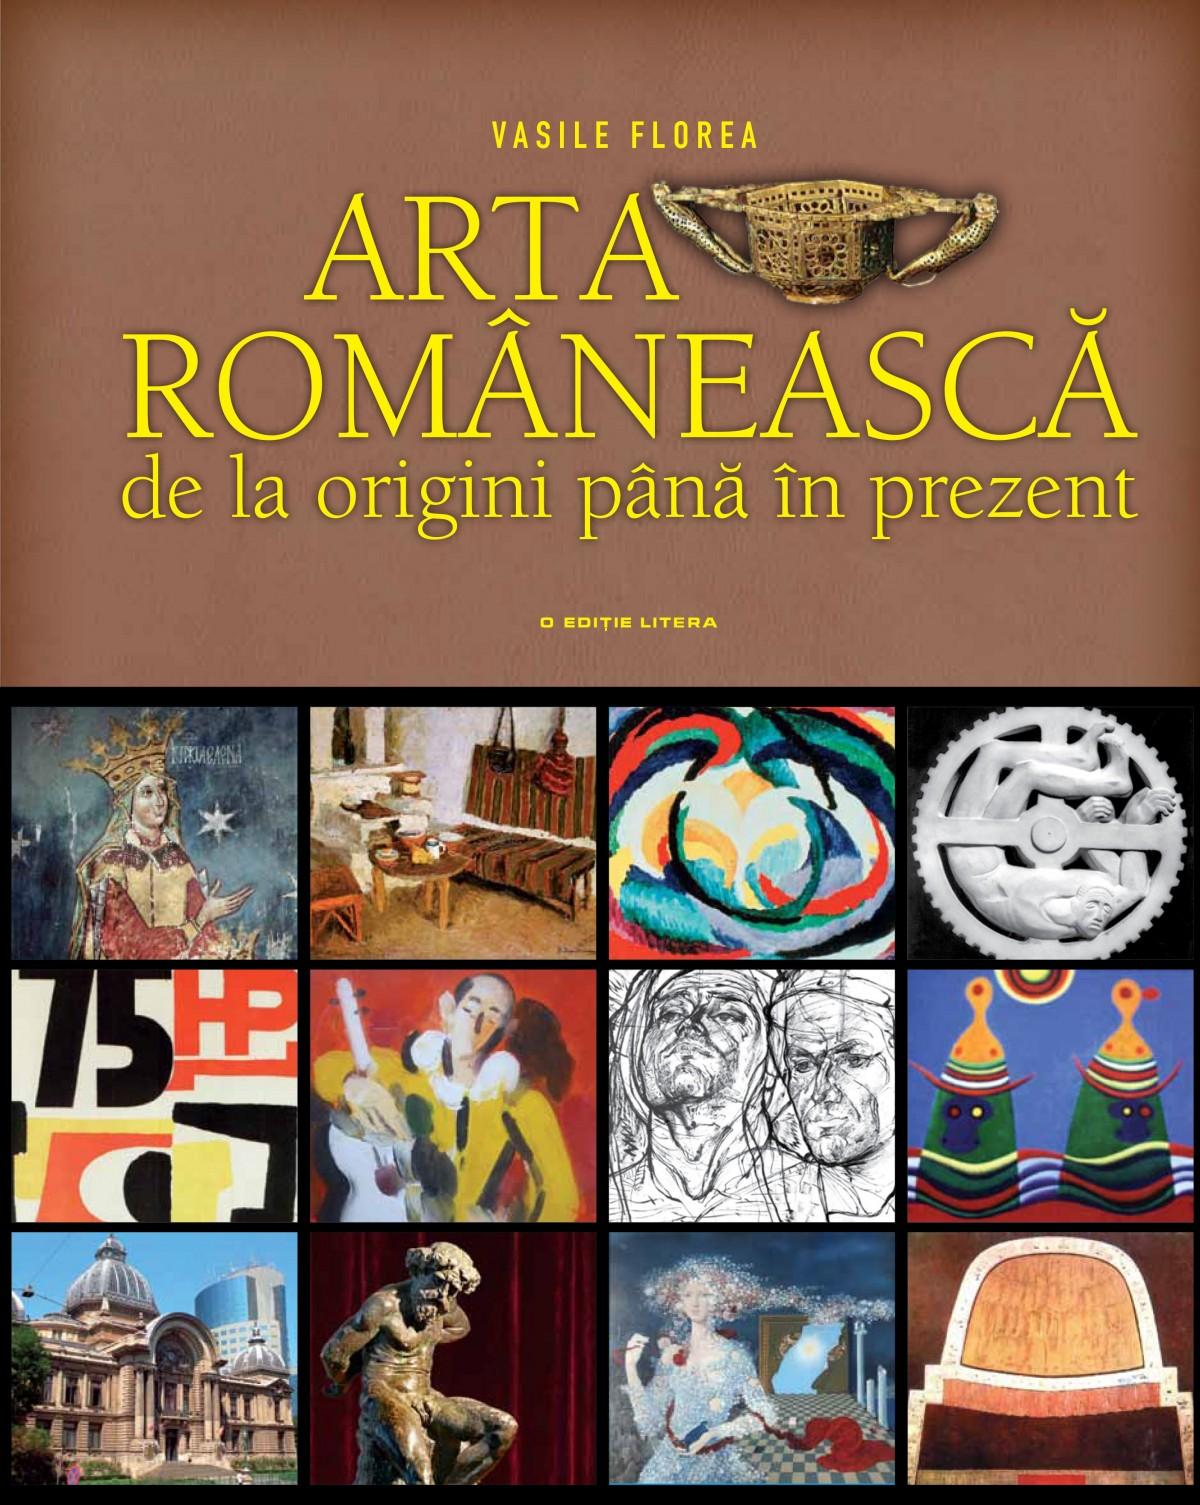 Arta romaneasca. De la origini pana in prezent